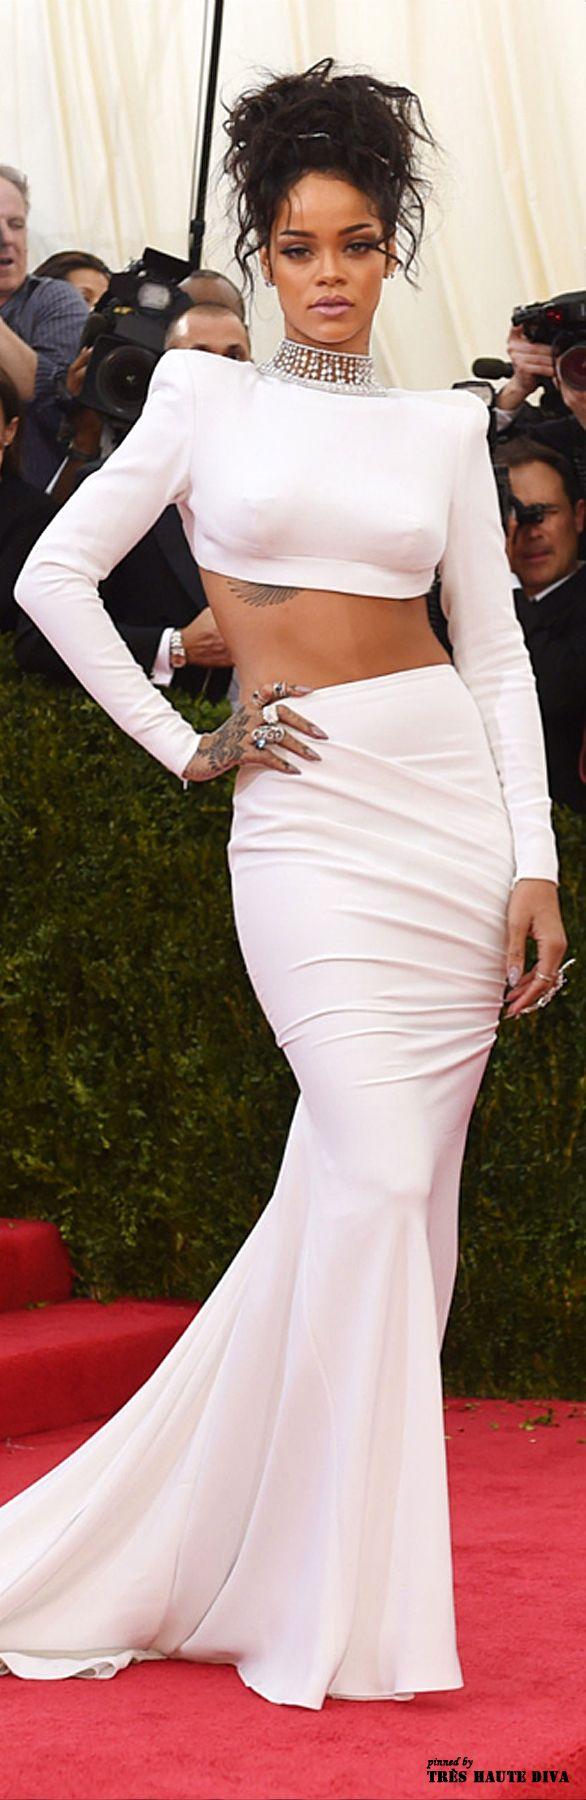 Rihanna in Stella McCartney at the Met Gala 2014 | Keep The Glamour ♡ ✤ LadyLuxury ✤